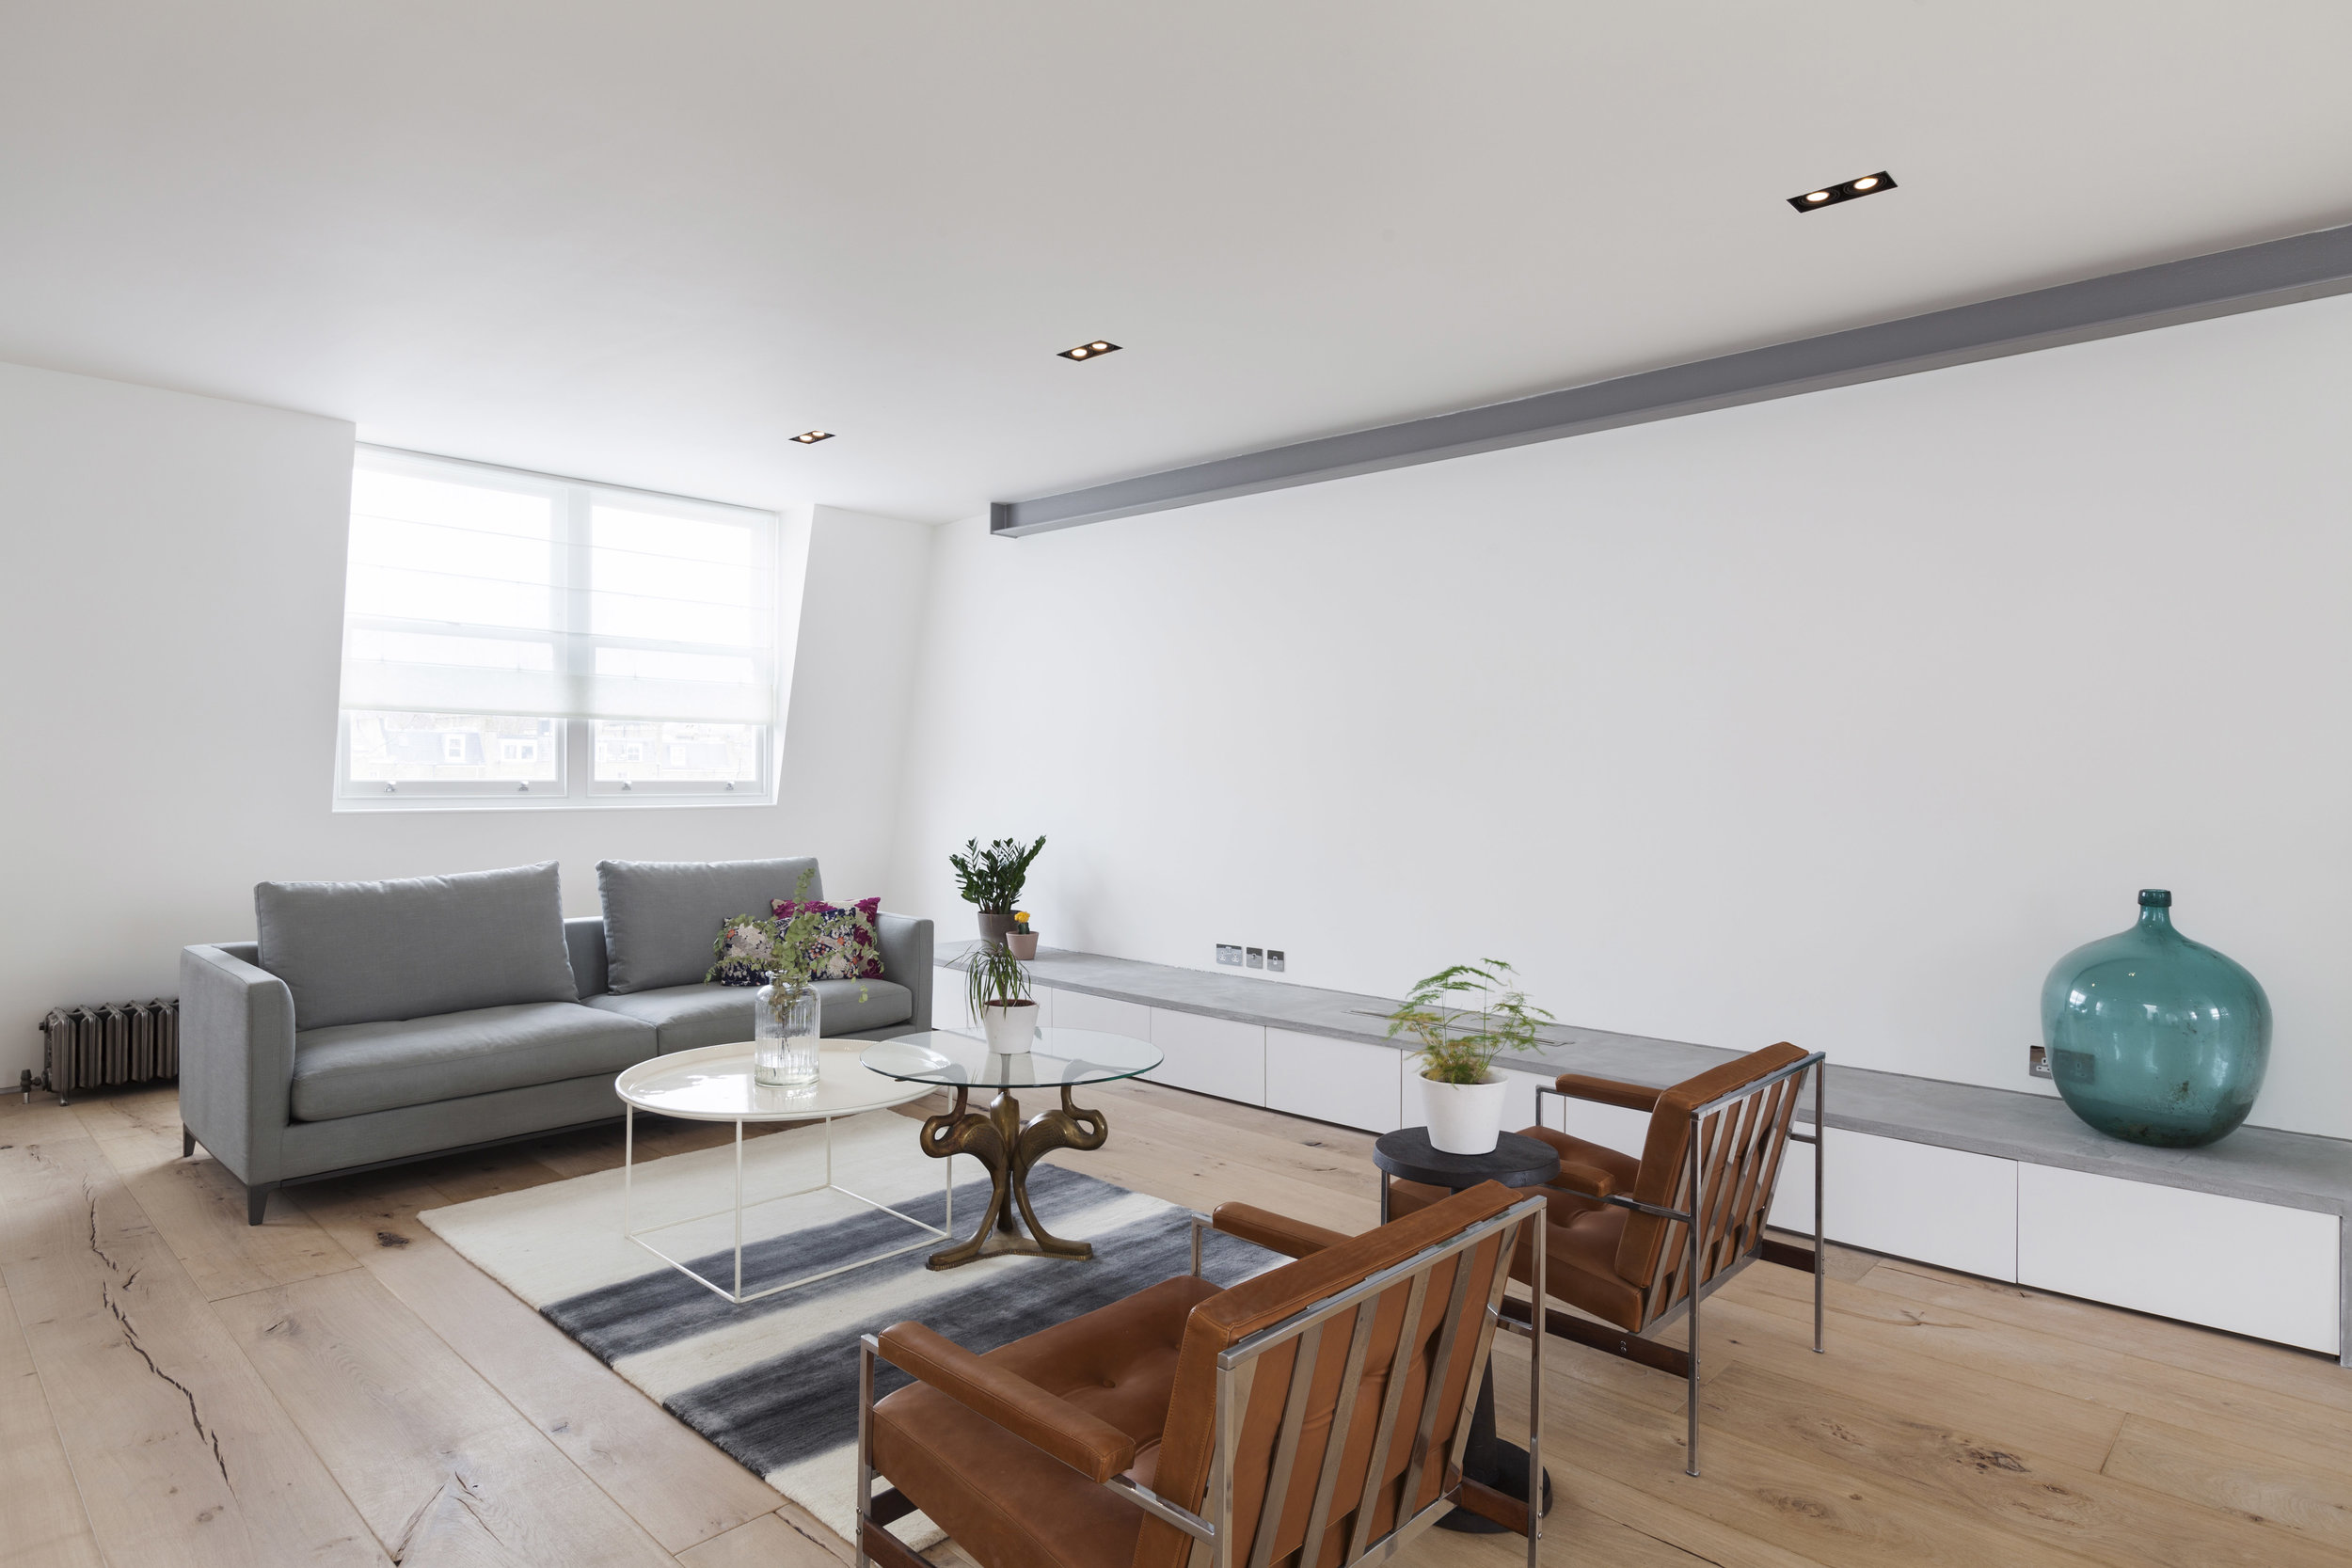 Domus-Nova-Sinclair-Road-London-Property-For-Sale-143.jpg